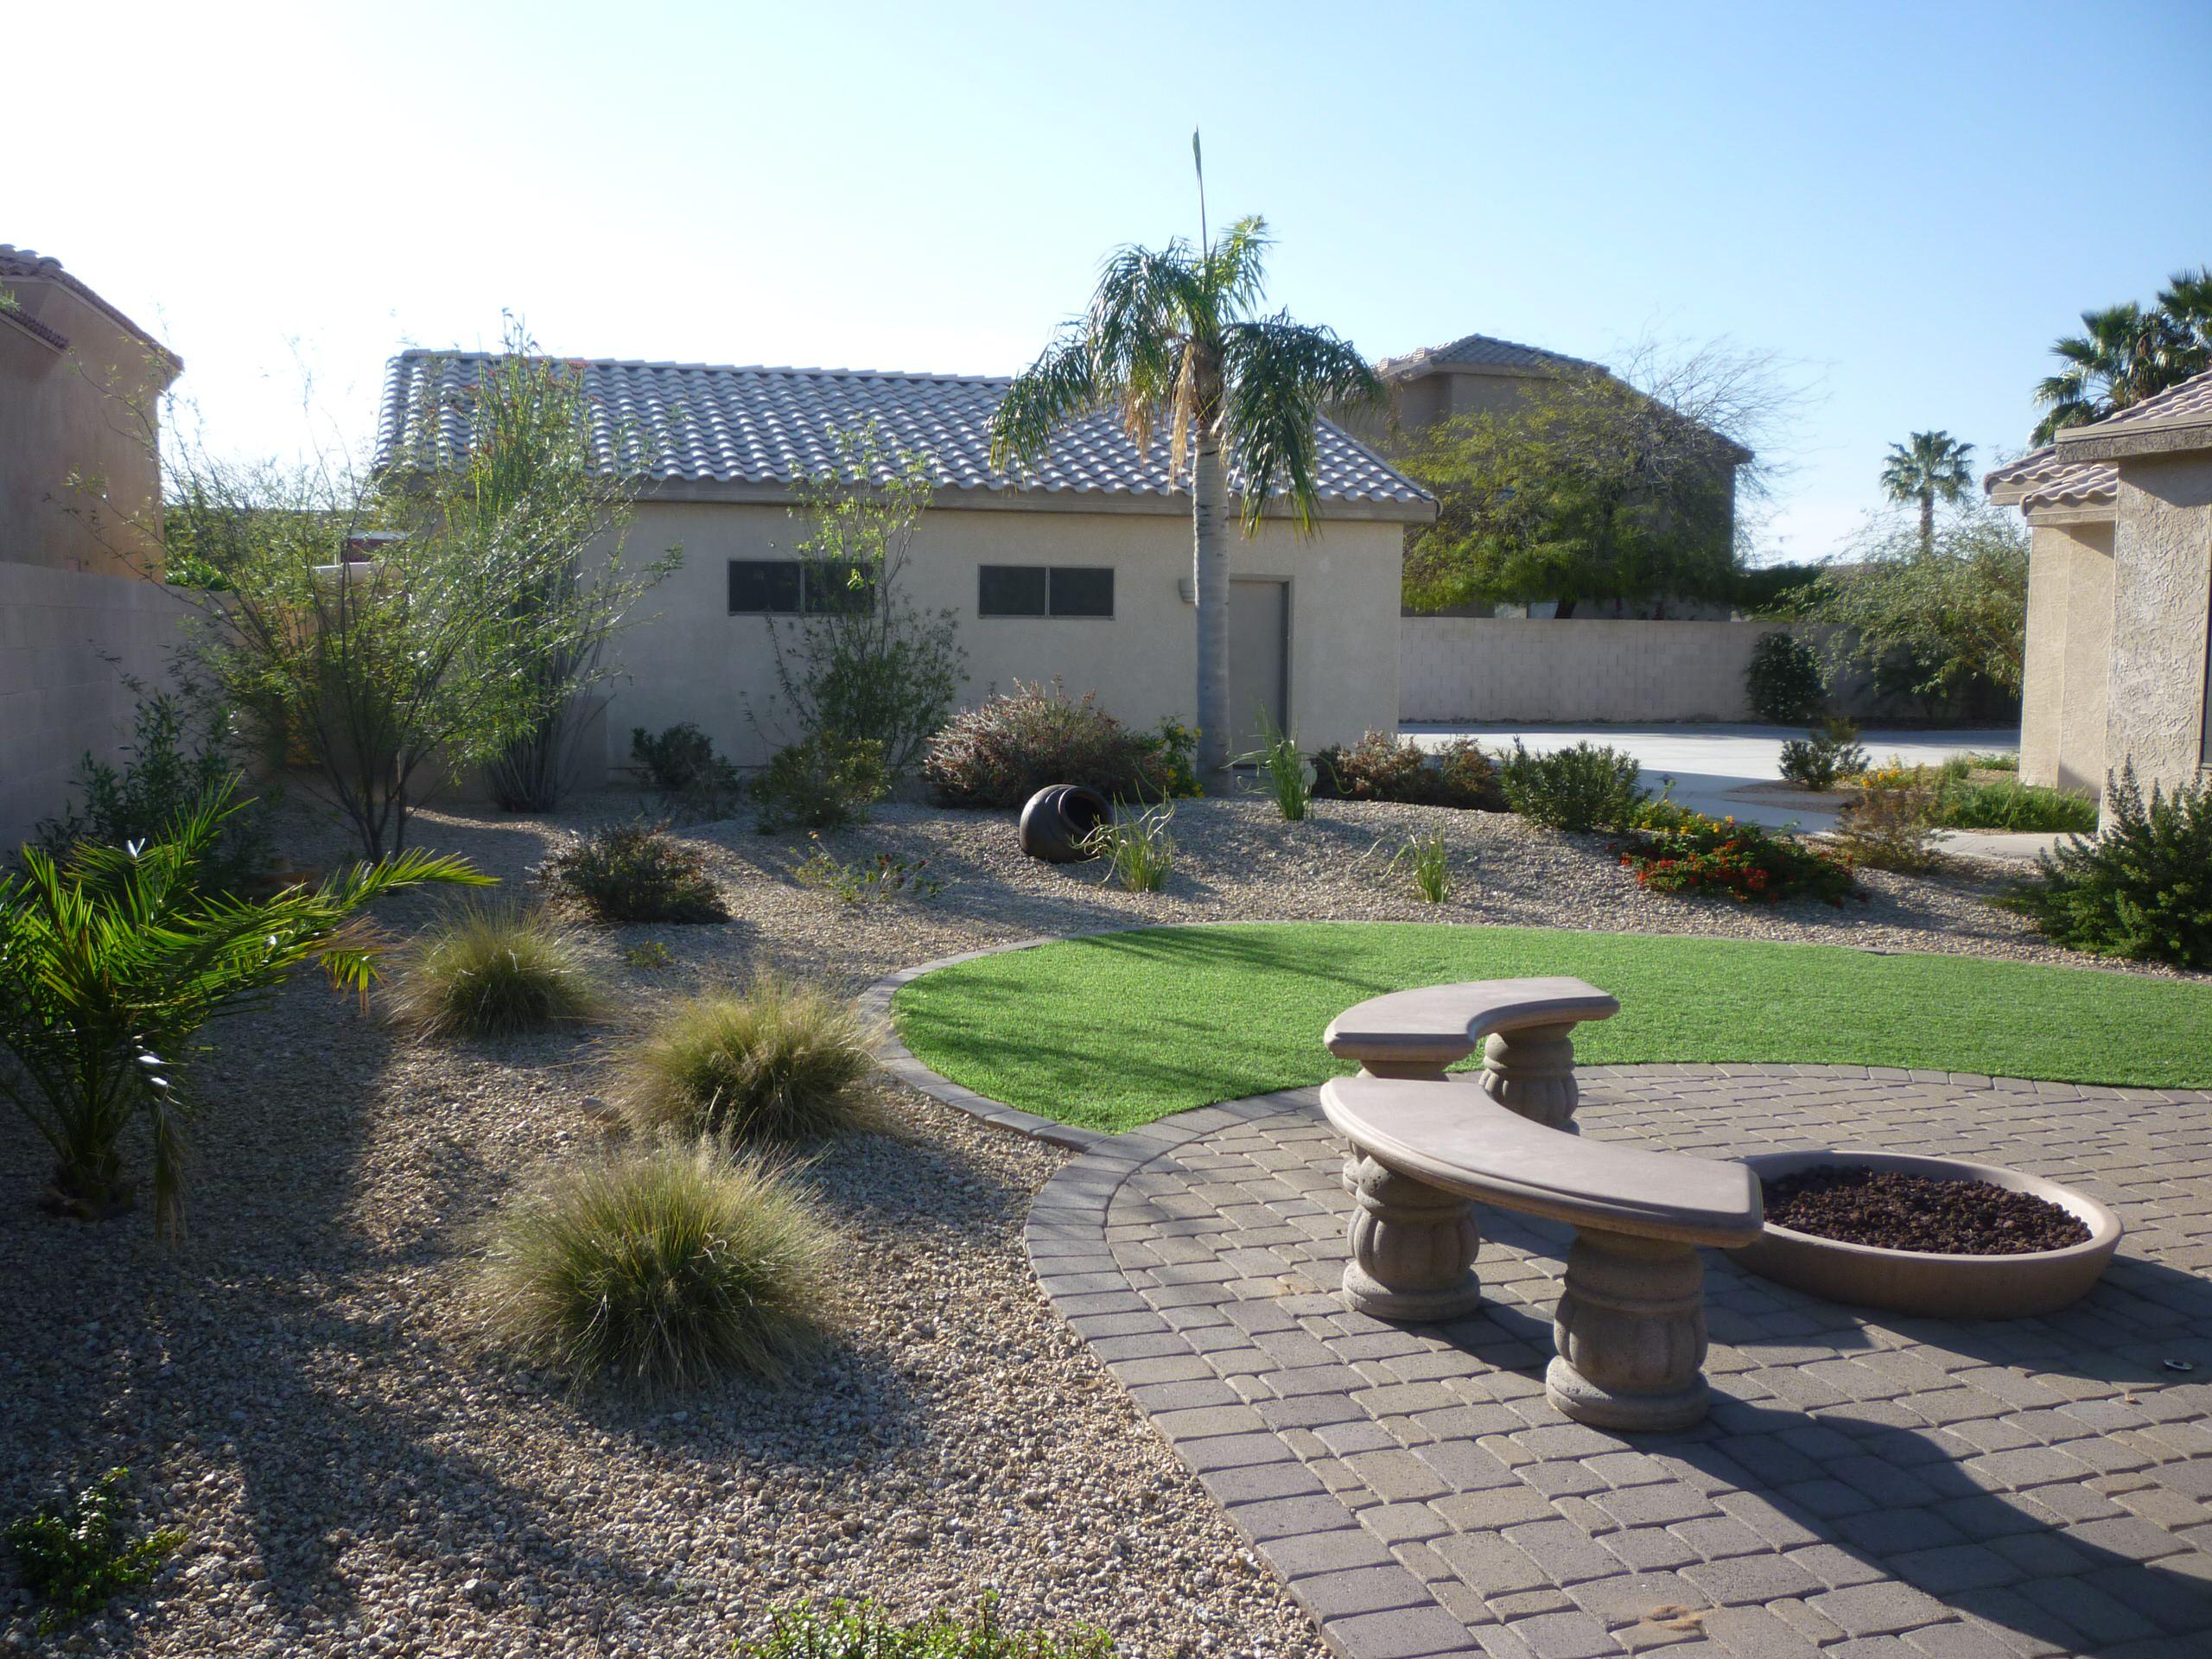 Backyard Plantings - 1.5 Years